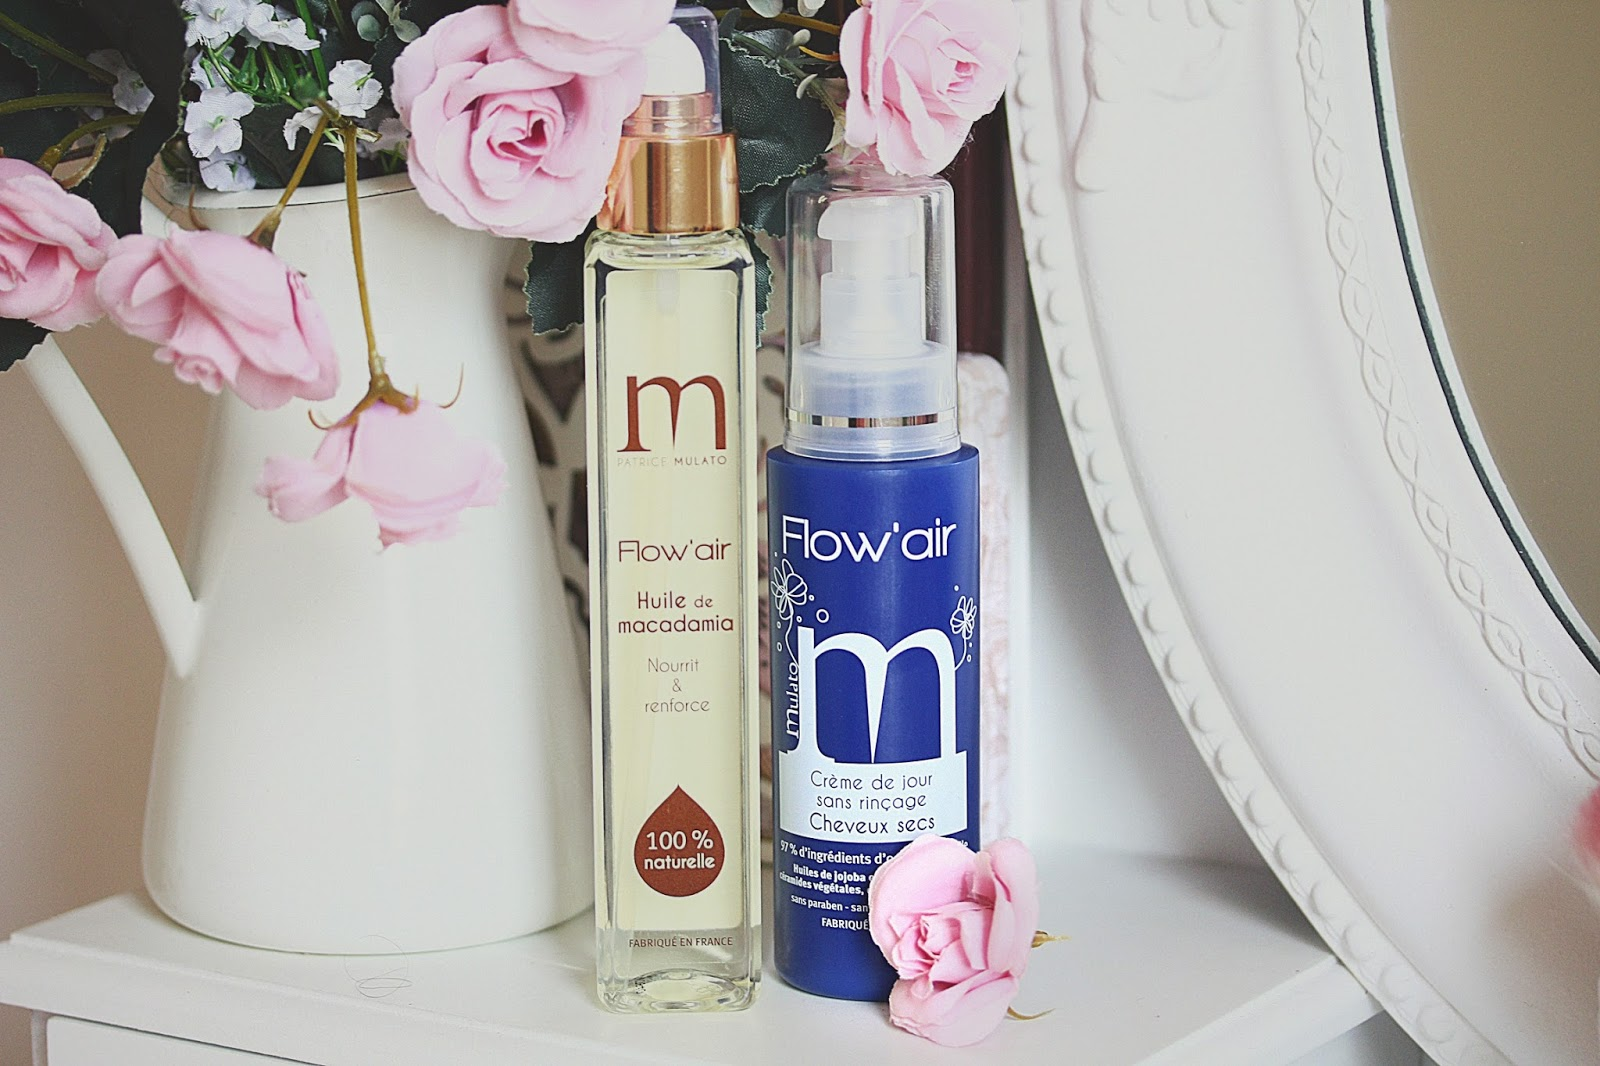 http://www.rosemademoiselle.com/2015/08/mulato-cosmetiques-flowair.html